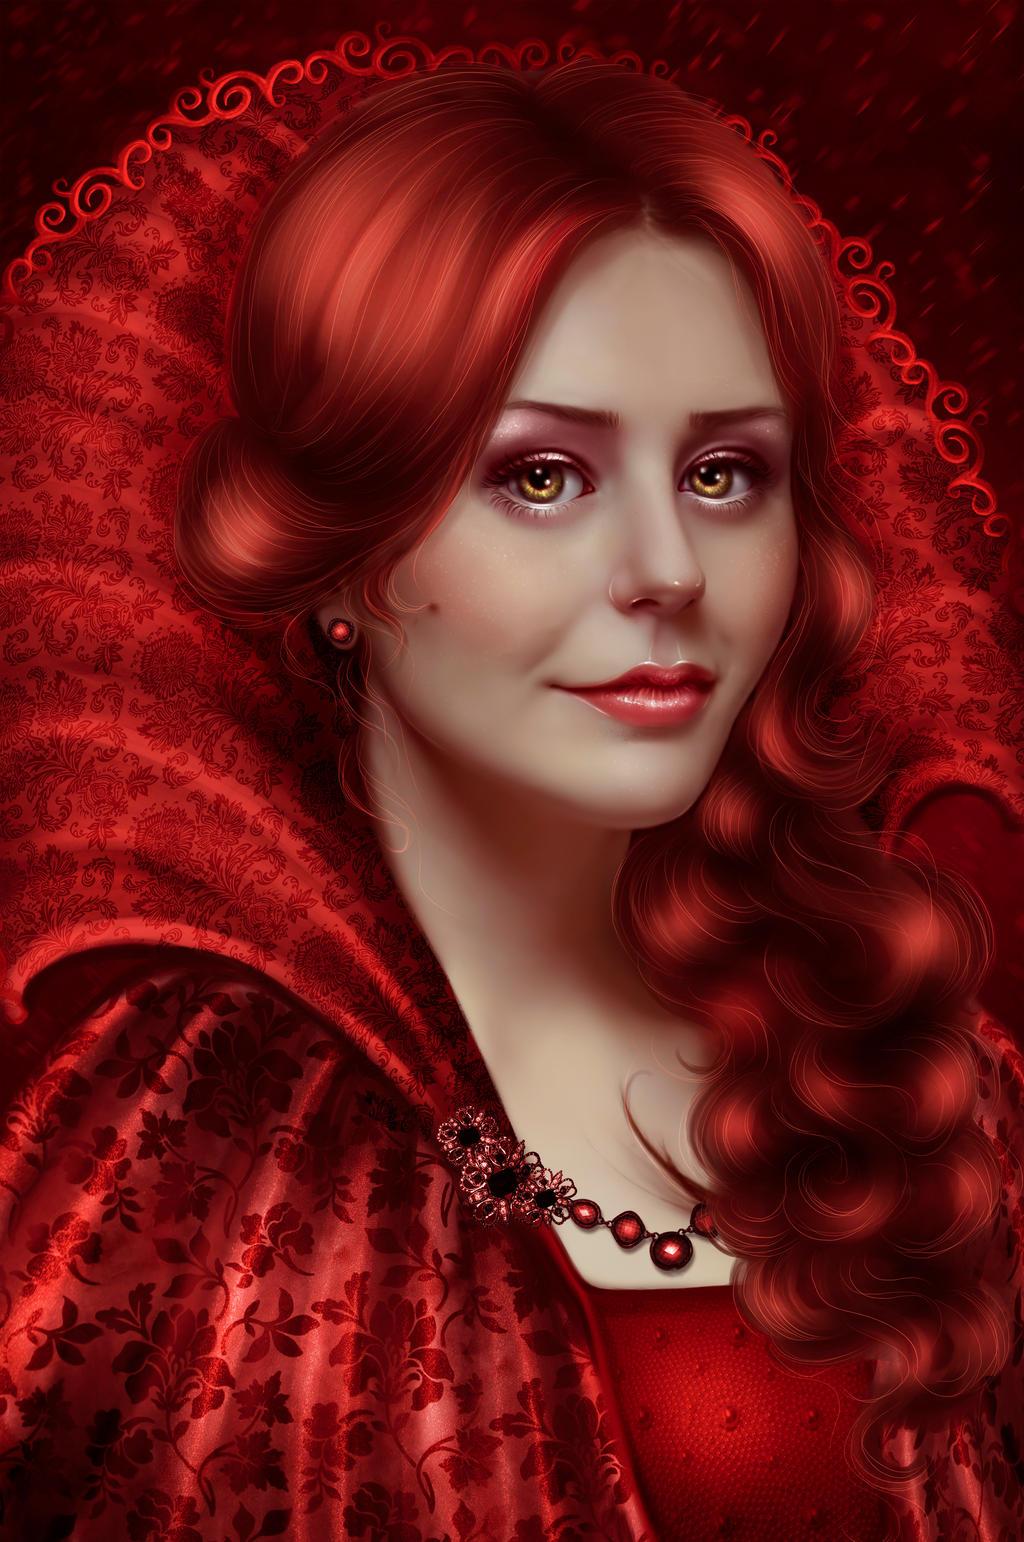 Lady in Red by IrinaPonochevnaya